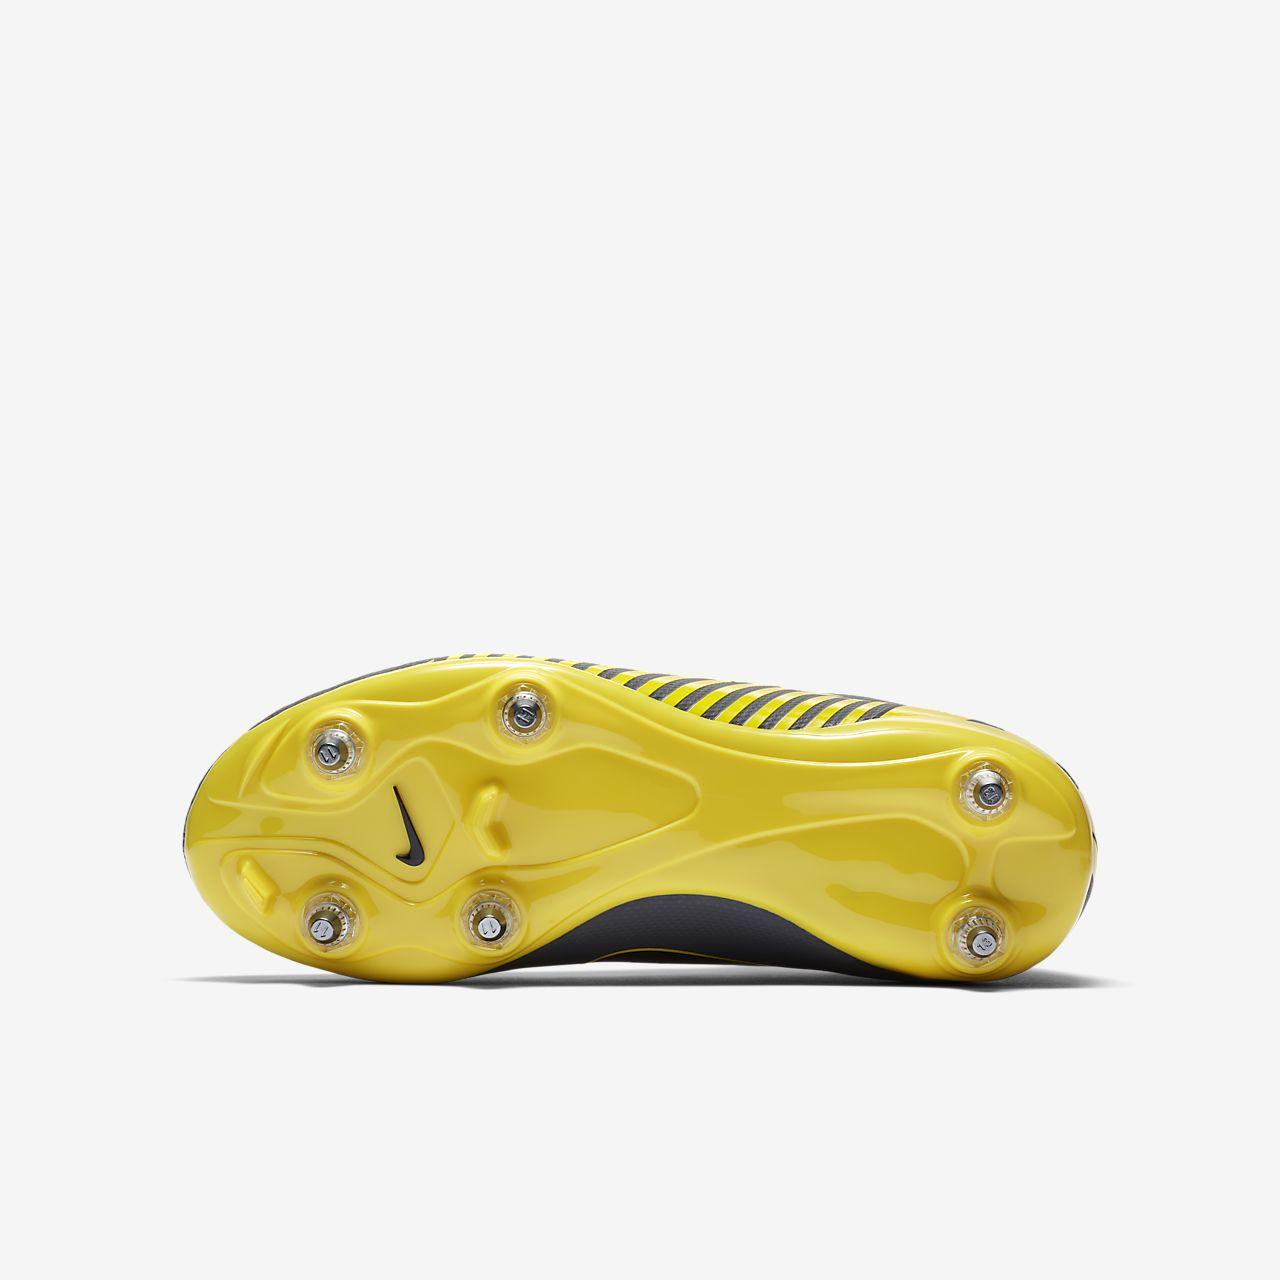 quality design 65deb a7f11 ... Chaussure de football à crampons pour terrain gras Nike Jr. Mercurial  Superfly VI Academy SG